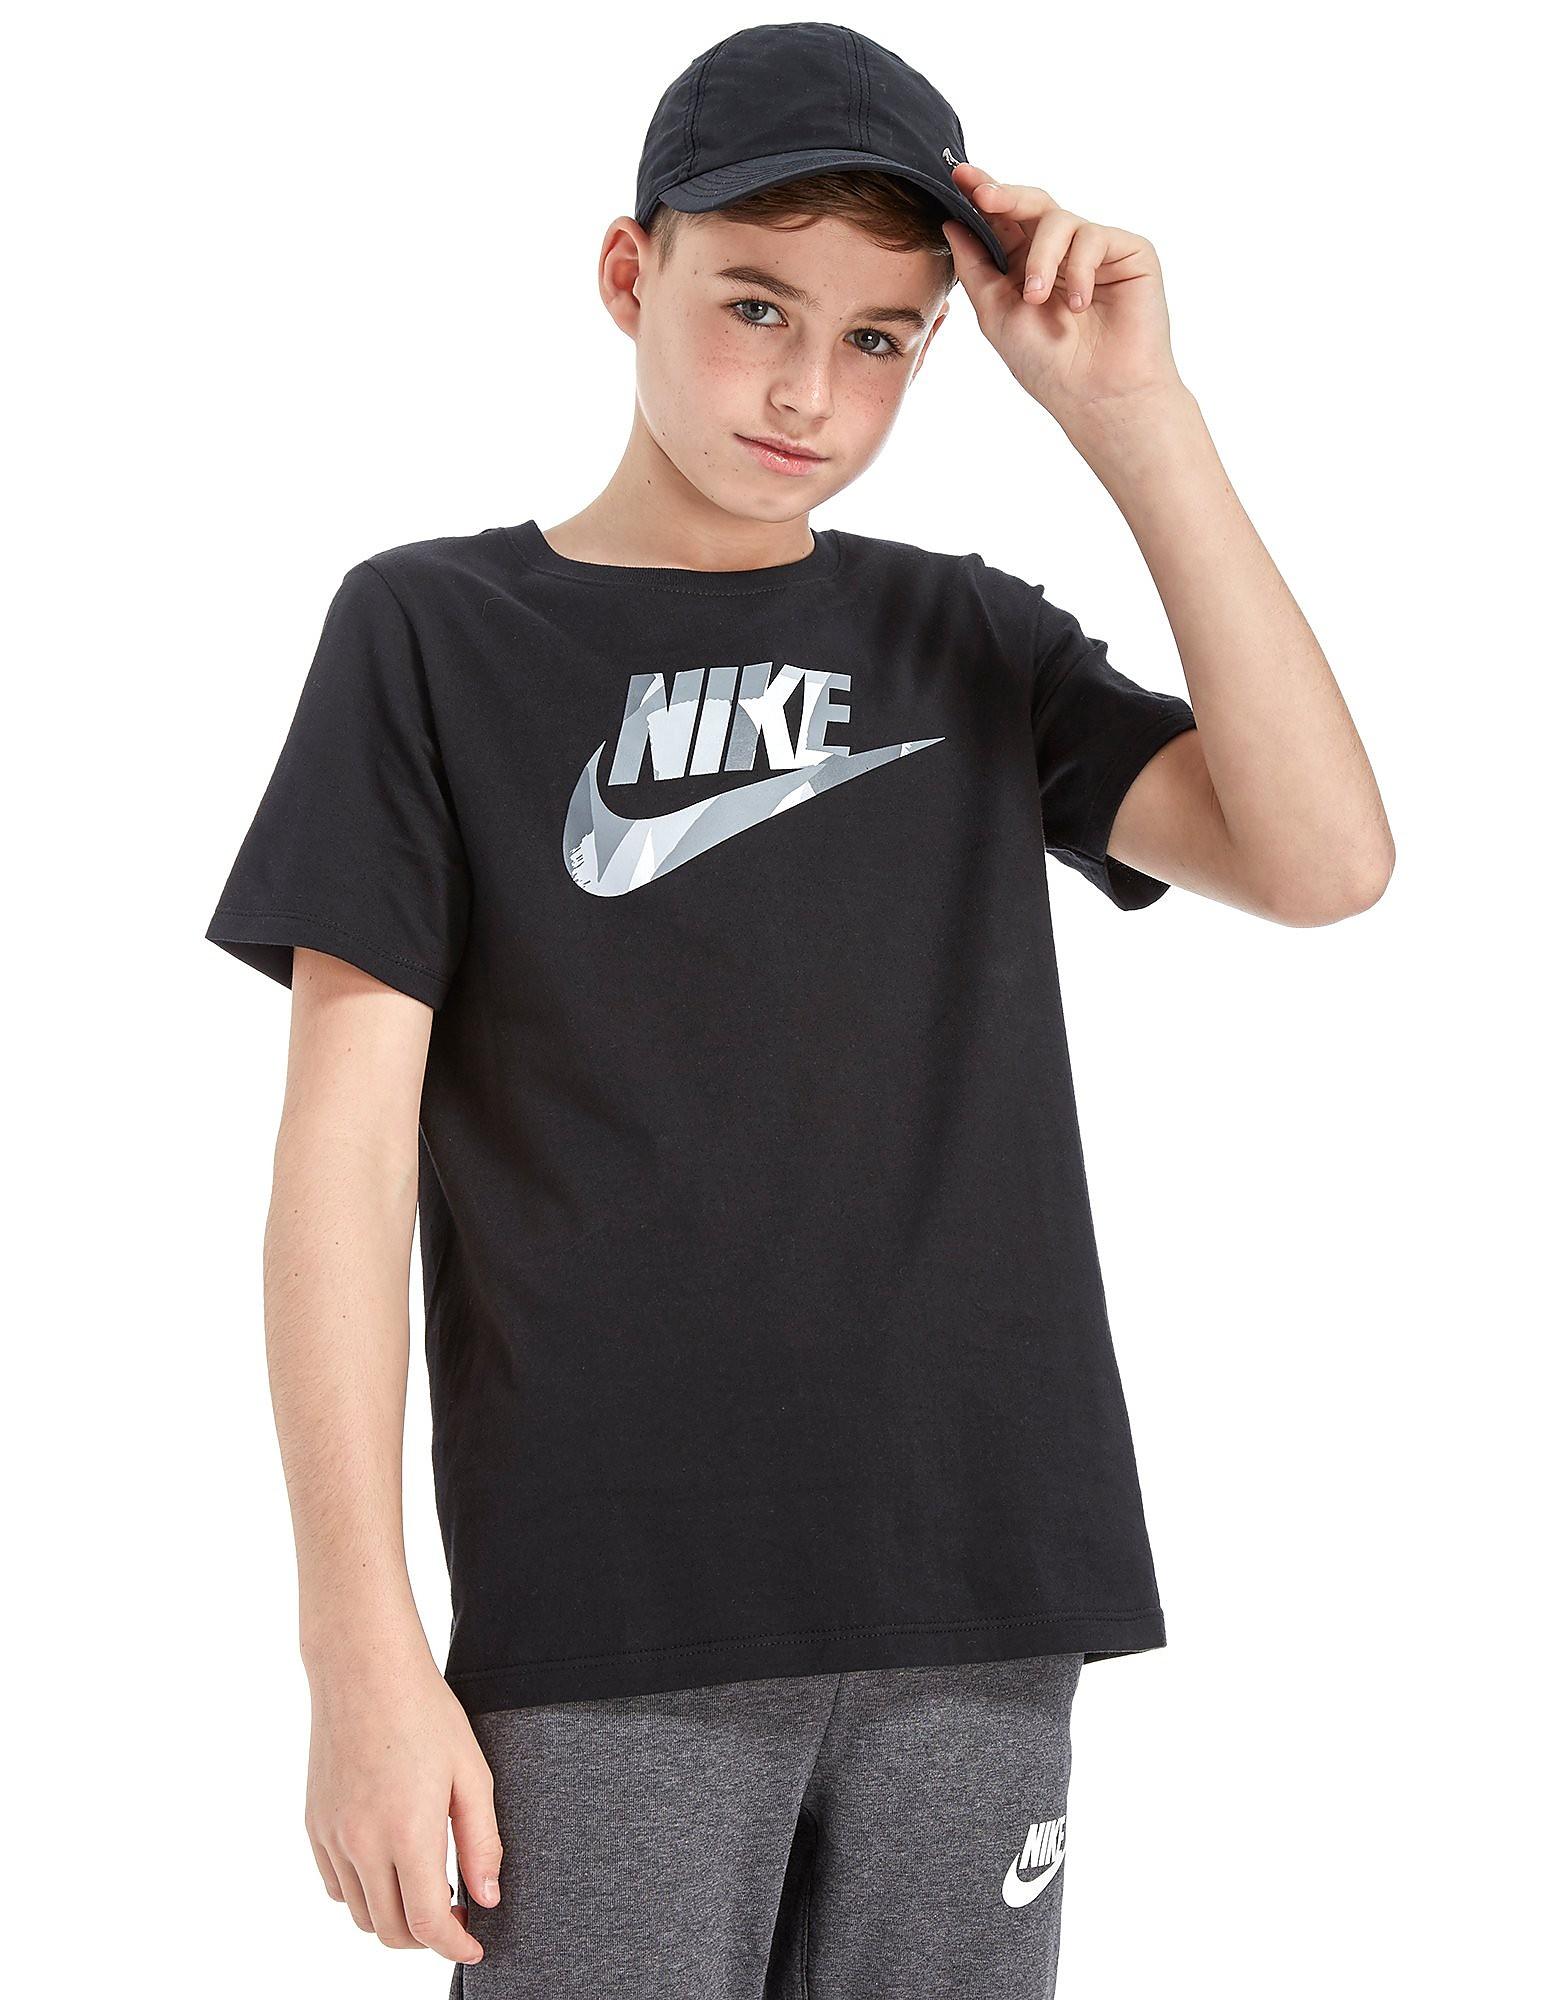 Nike Tarn Infill T-Shirt Junior